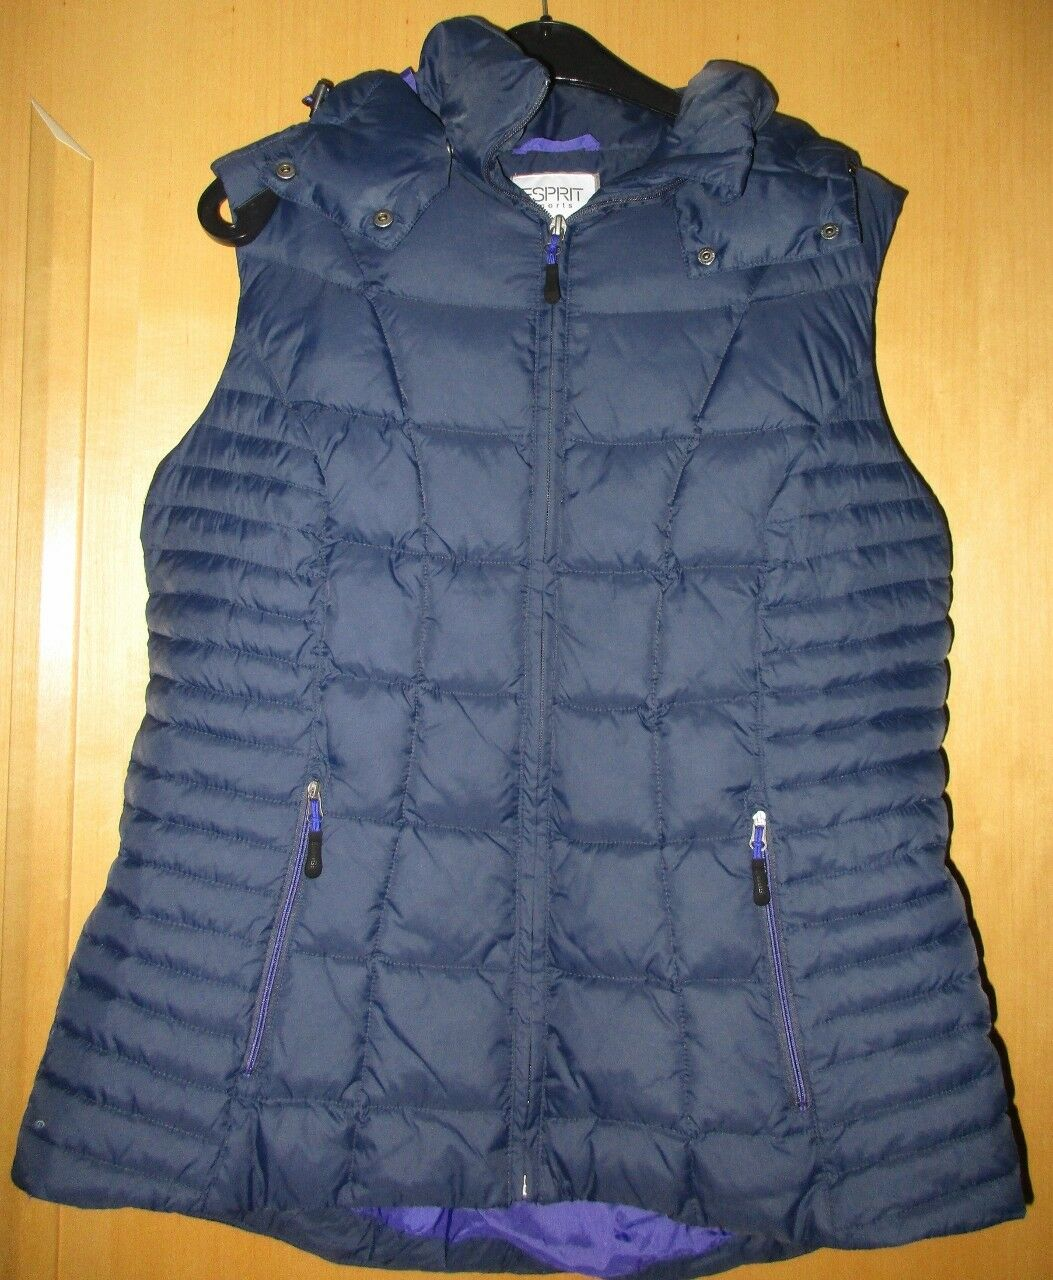 Esprit sports Steppweste Weste Stepp ärmellose Jacke Kapuze blau dunkelblau XL